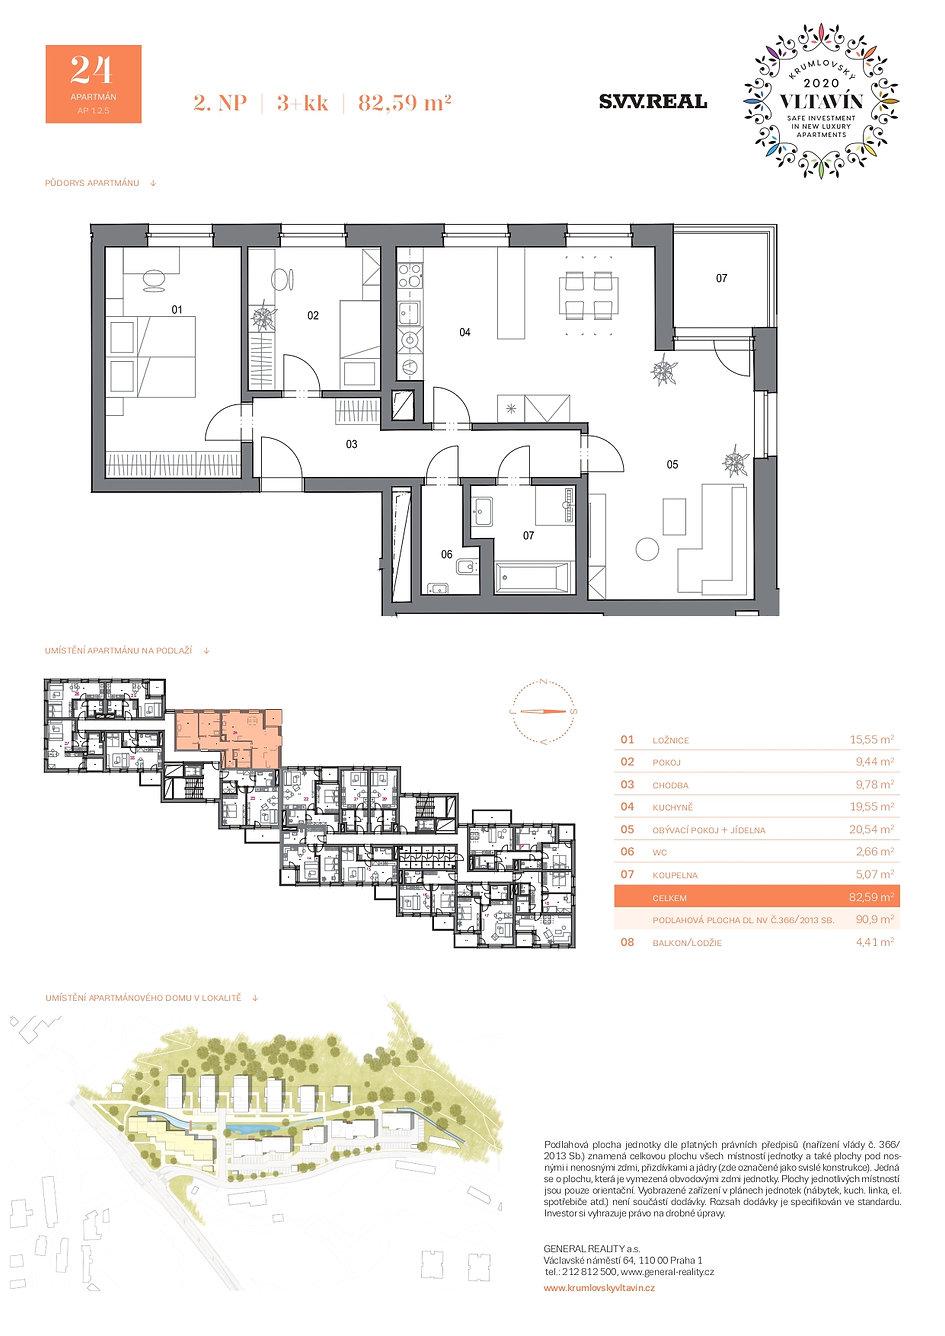 GR_krumlovsky-vltavin_bytove-karty-apartmany_2NP_A24_page-0001.jpg